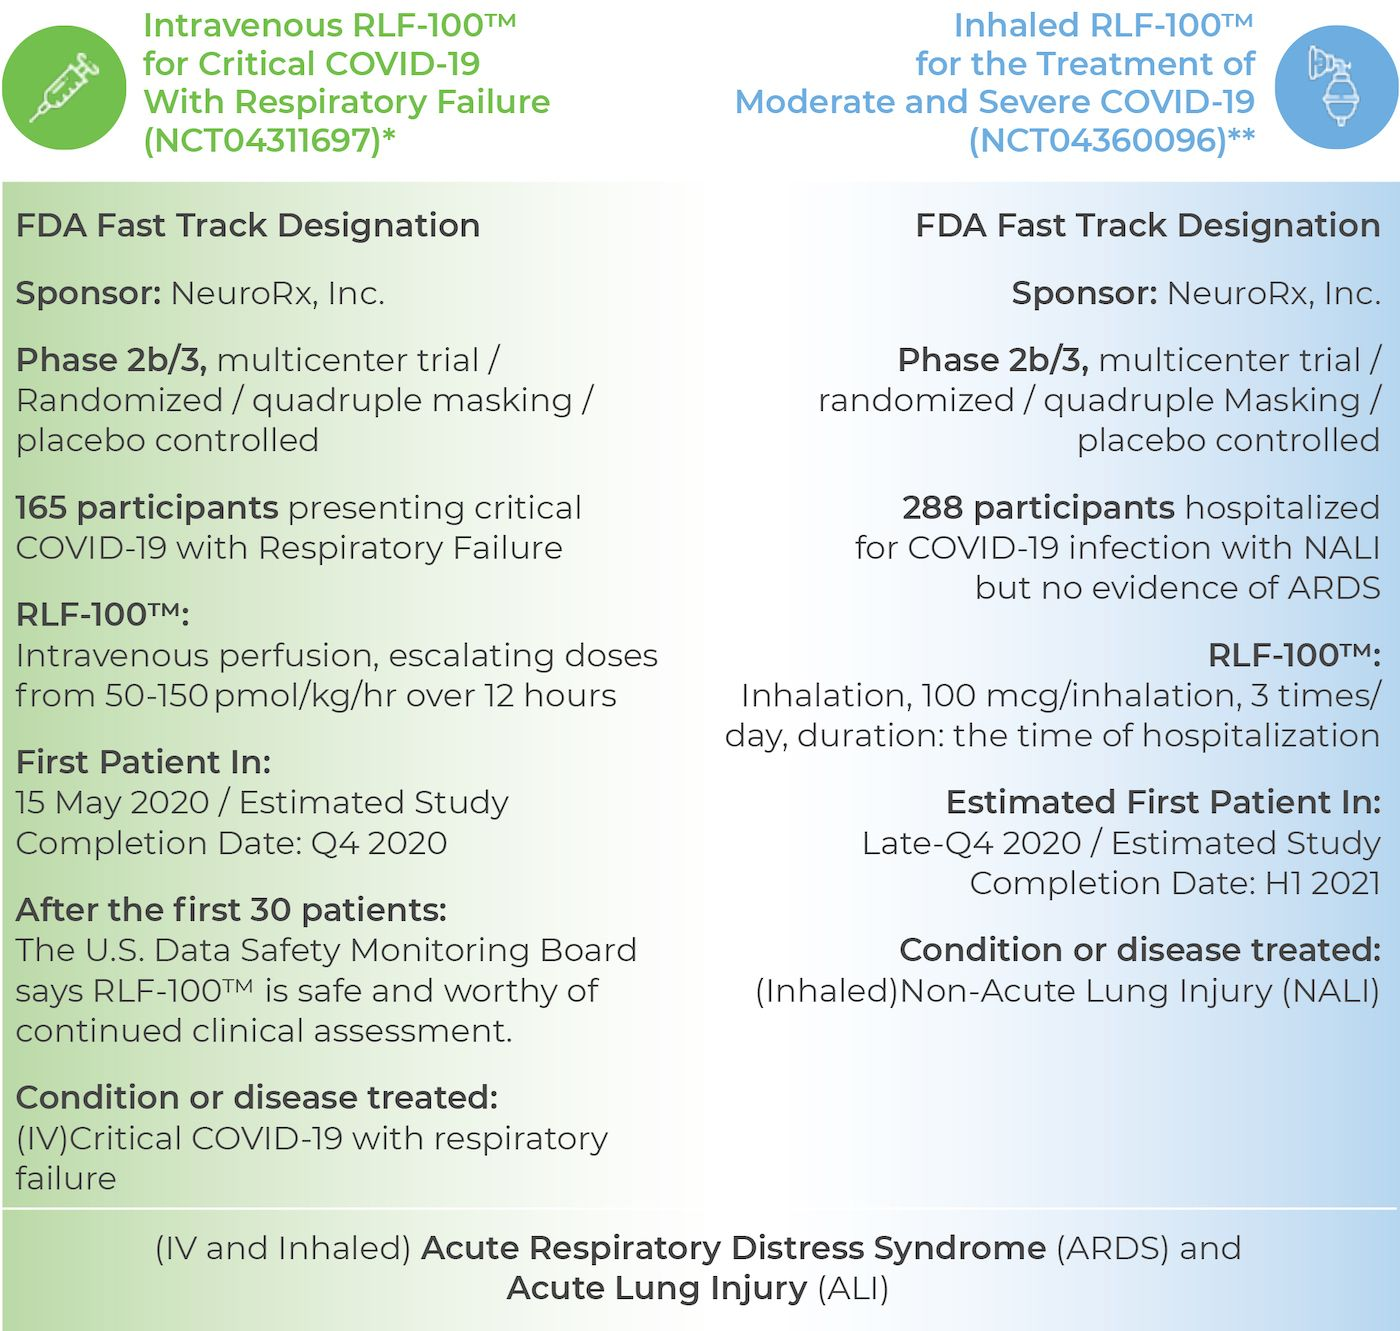 Relief Therapeutics (OTC:RLFTF): RLF-100 bigger than Pfizer (PFE) and Moderna (MRNA)